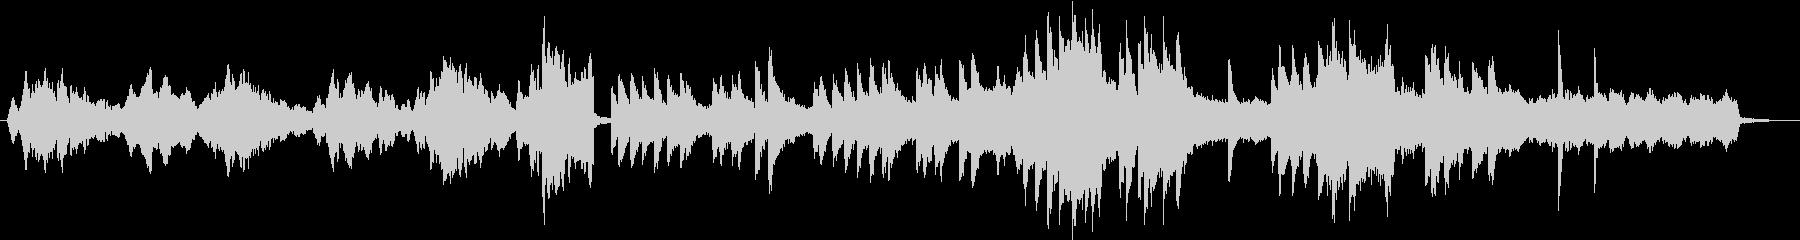 CM・ピアノとストリングス・幻想・切ないの未再生の波形